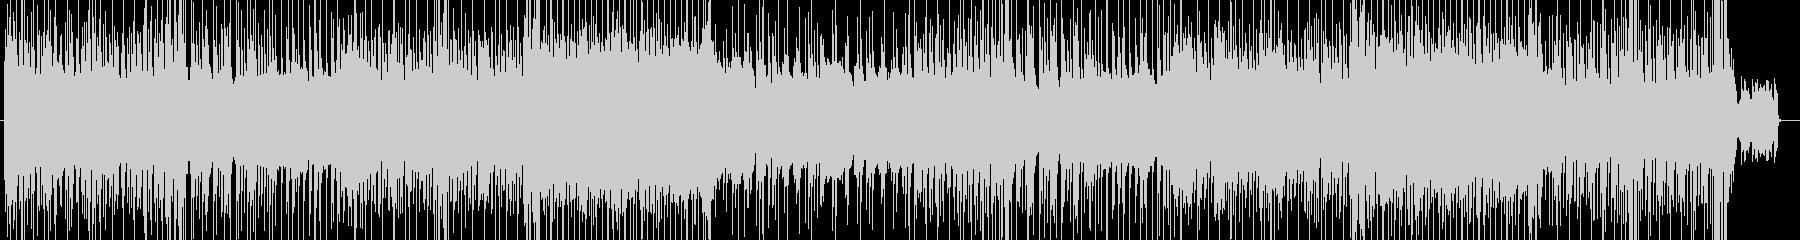 HARD・DARK/DEATH 294の未再生の波形